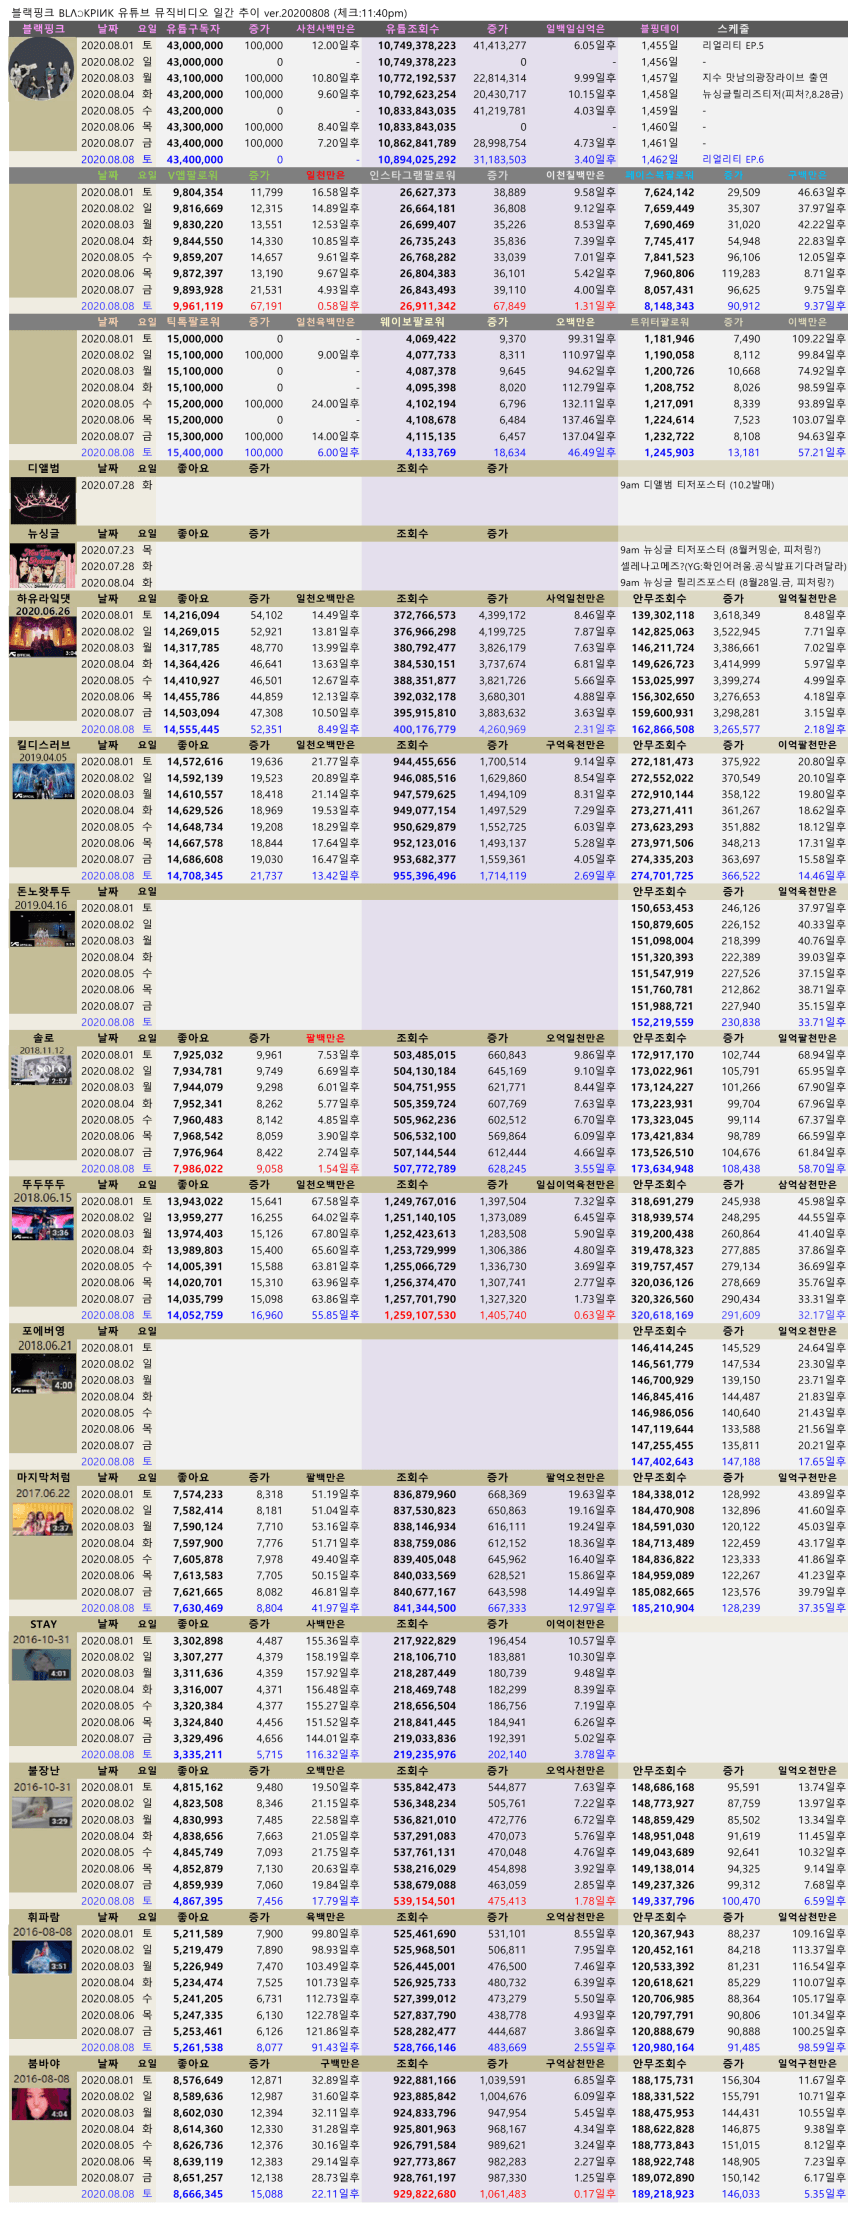 viewimage.php?id=2fb1d125eec231a865&no=24b0d769e1d32ca73fed8ffa11d028317805b44c4c832ef9bd9f2eca3d3fa89ca77b7c593e8515821565aab4558ef31cb9a527b9fd497d17dcd2dd4b337f2e66a9c6a9836b